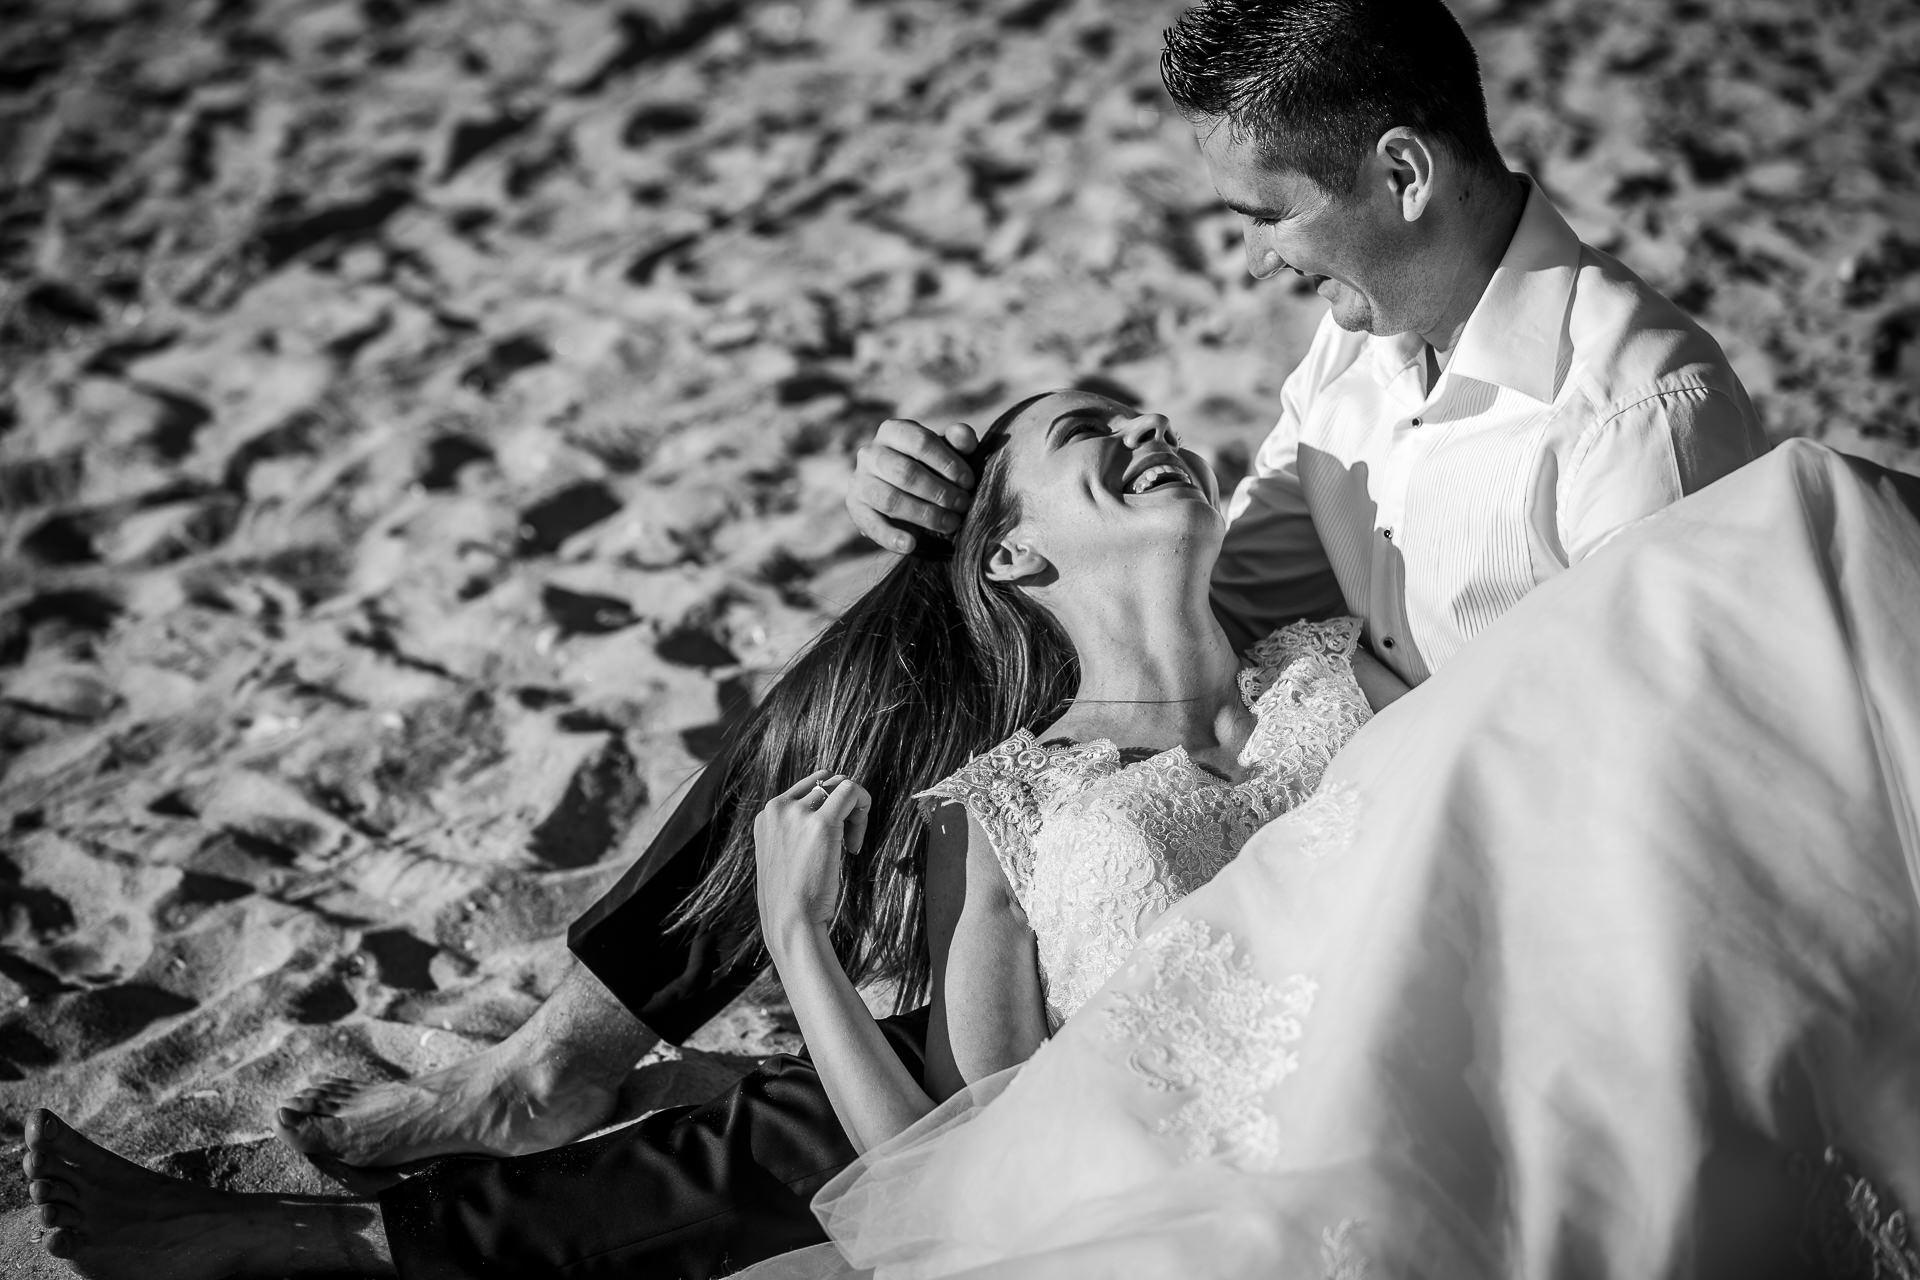 Şedinţă foto Trash The Dress - Vadu + Midia - Mihaela şi Alexandru - Mihai Zaharia Photography - 02